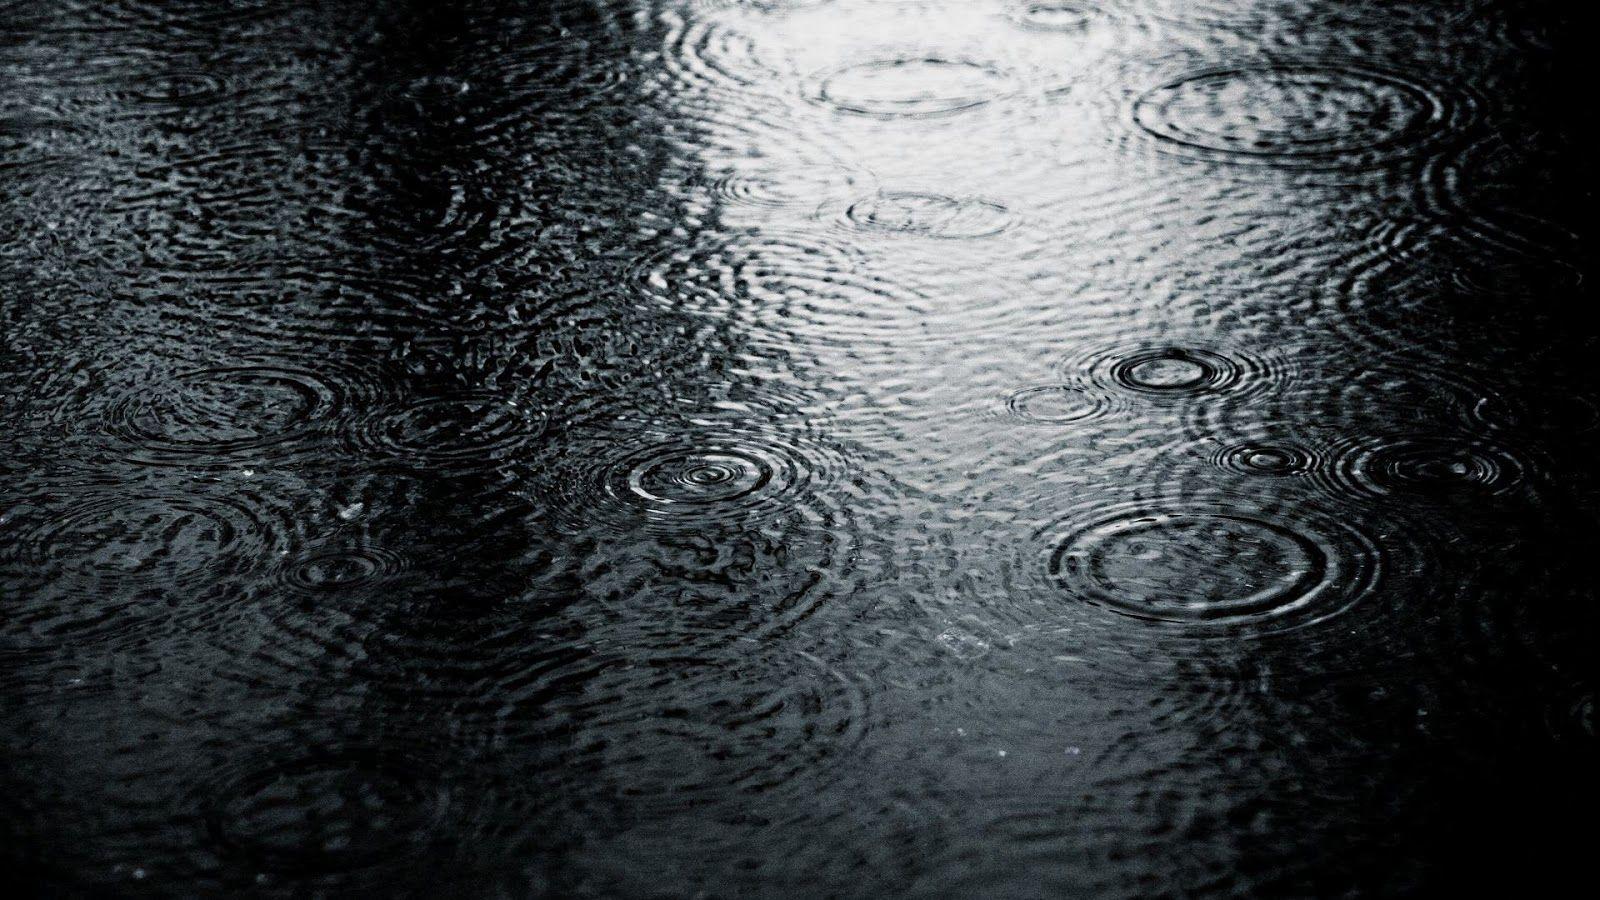 Rainy Day Wallpaper Rain Wallpapers Rainy Day Wallpaper Rainy Day Pictures